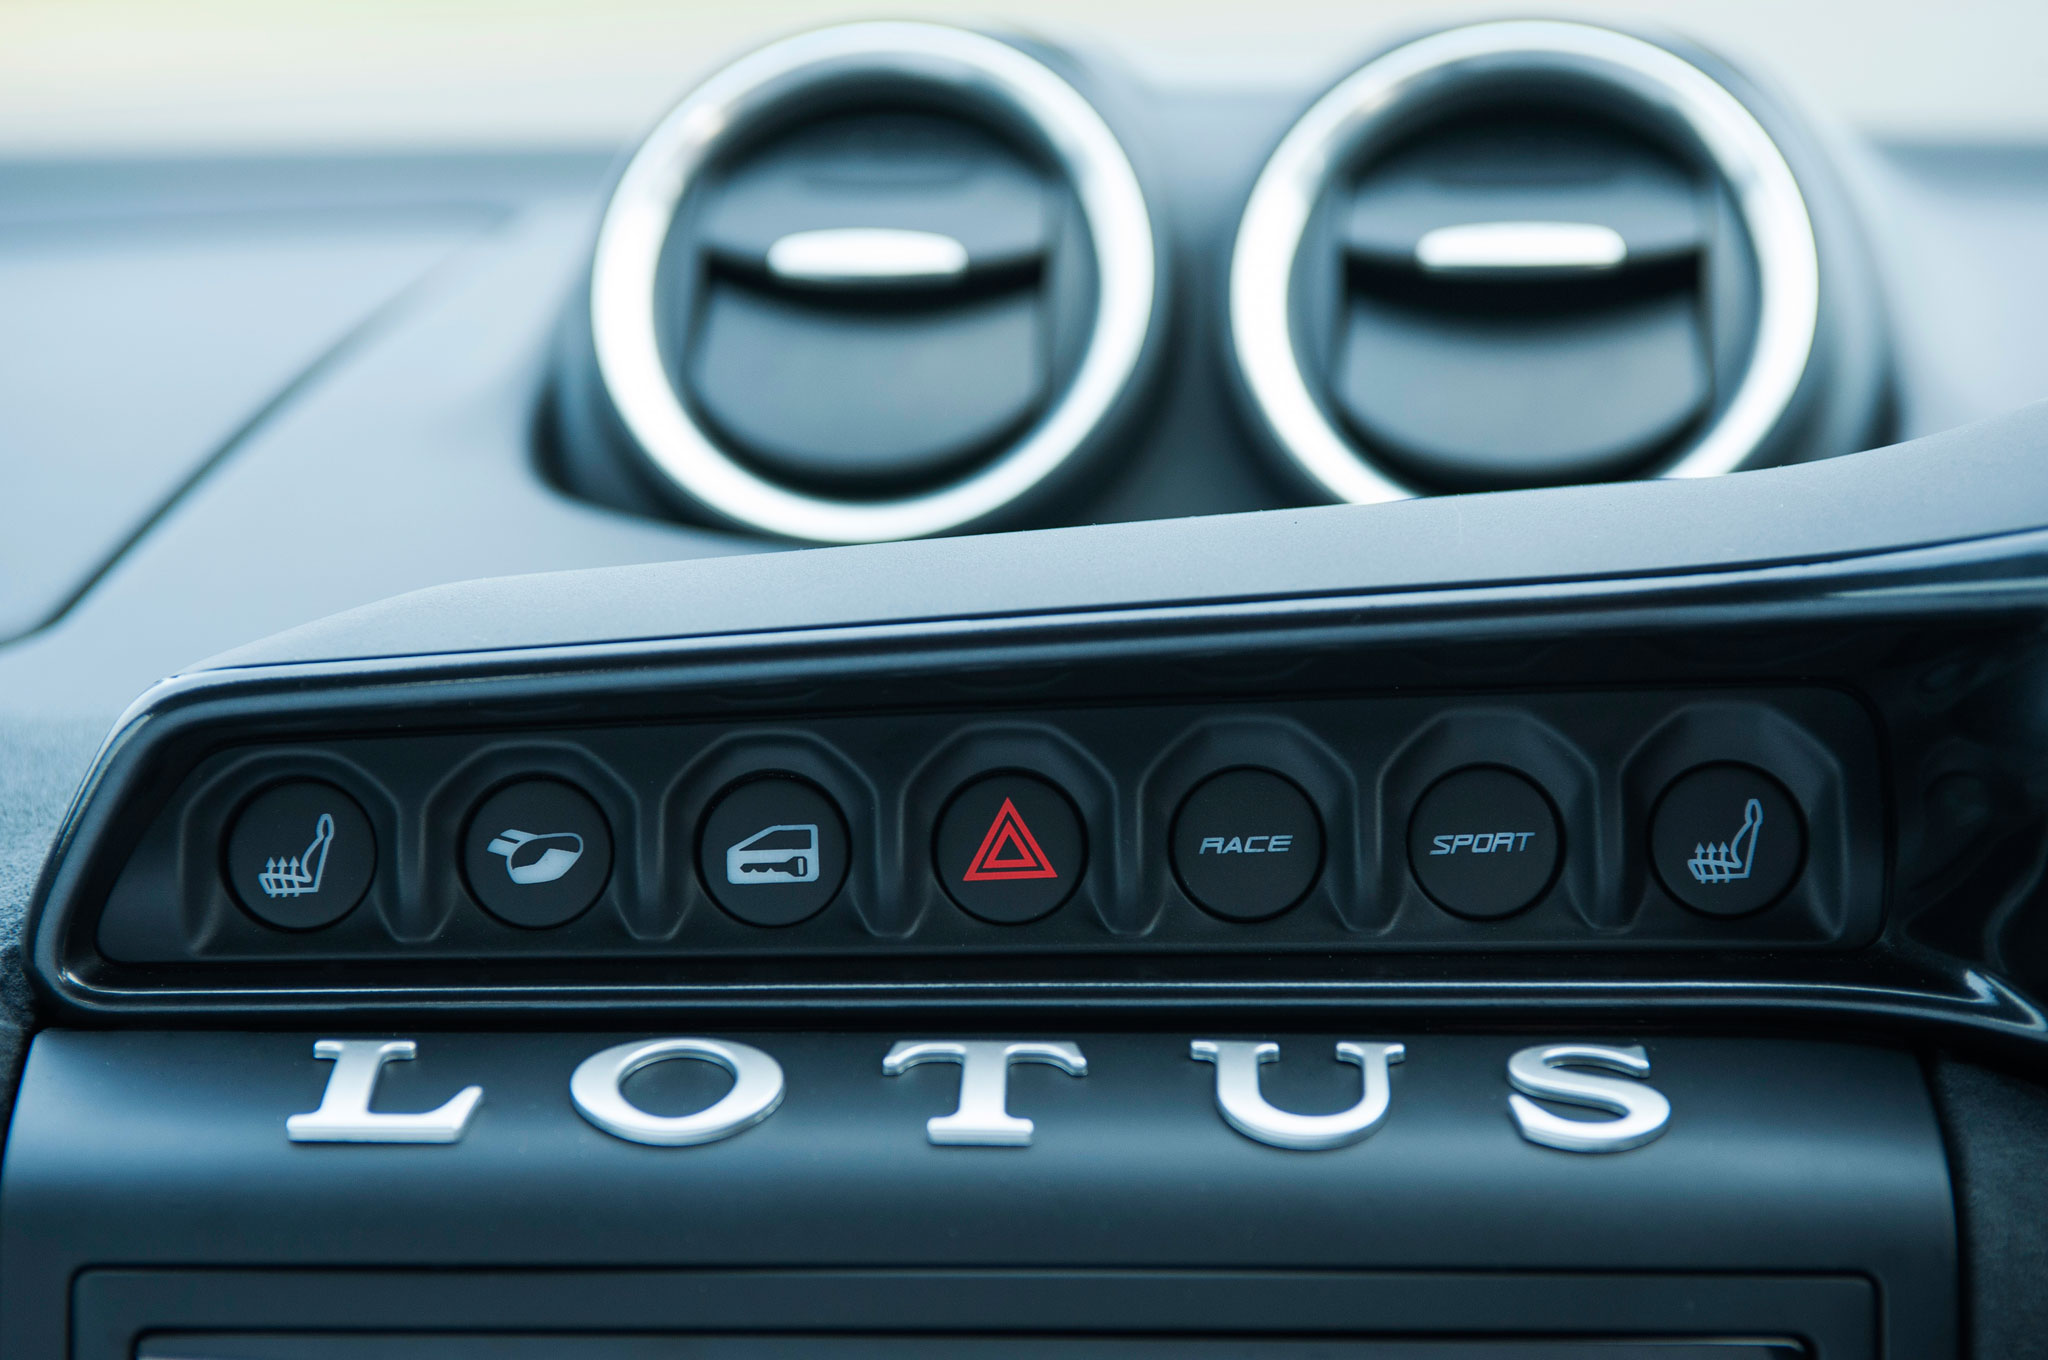 http://st.automobilemag.com/uploads/sites/11/2015/08/2016-Lotus-Evora-400-dashboard-detail.jpg